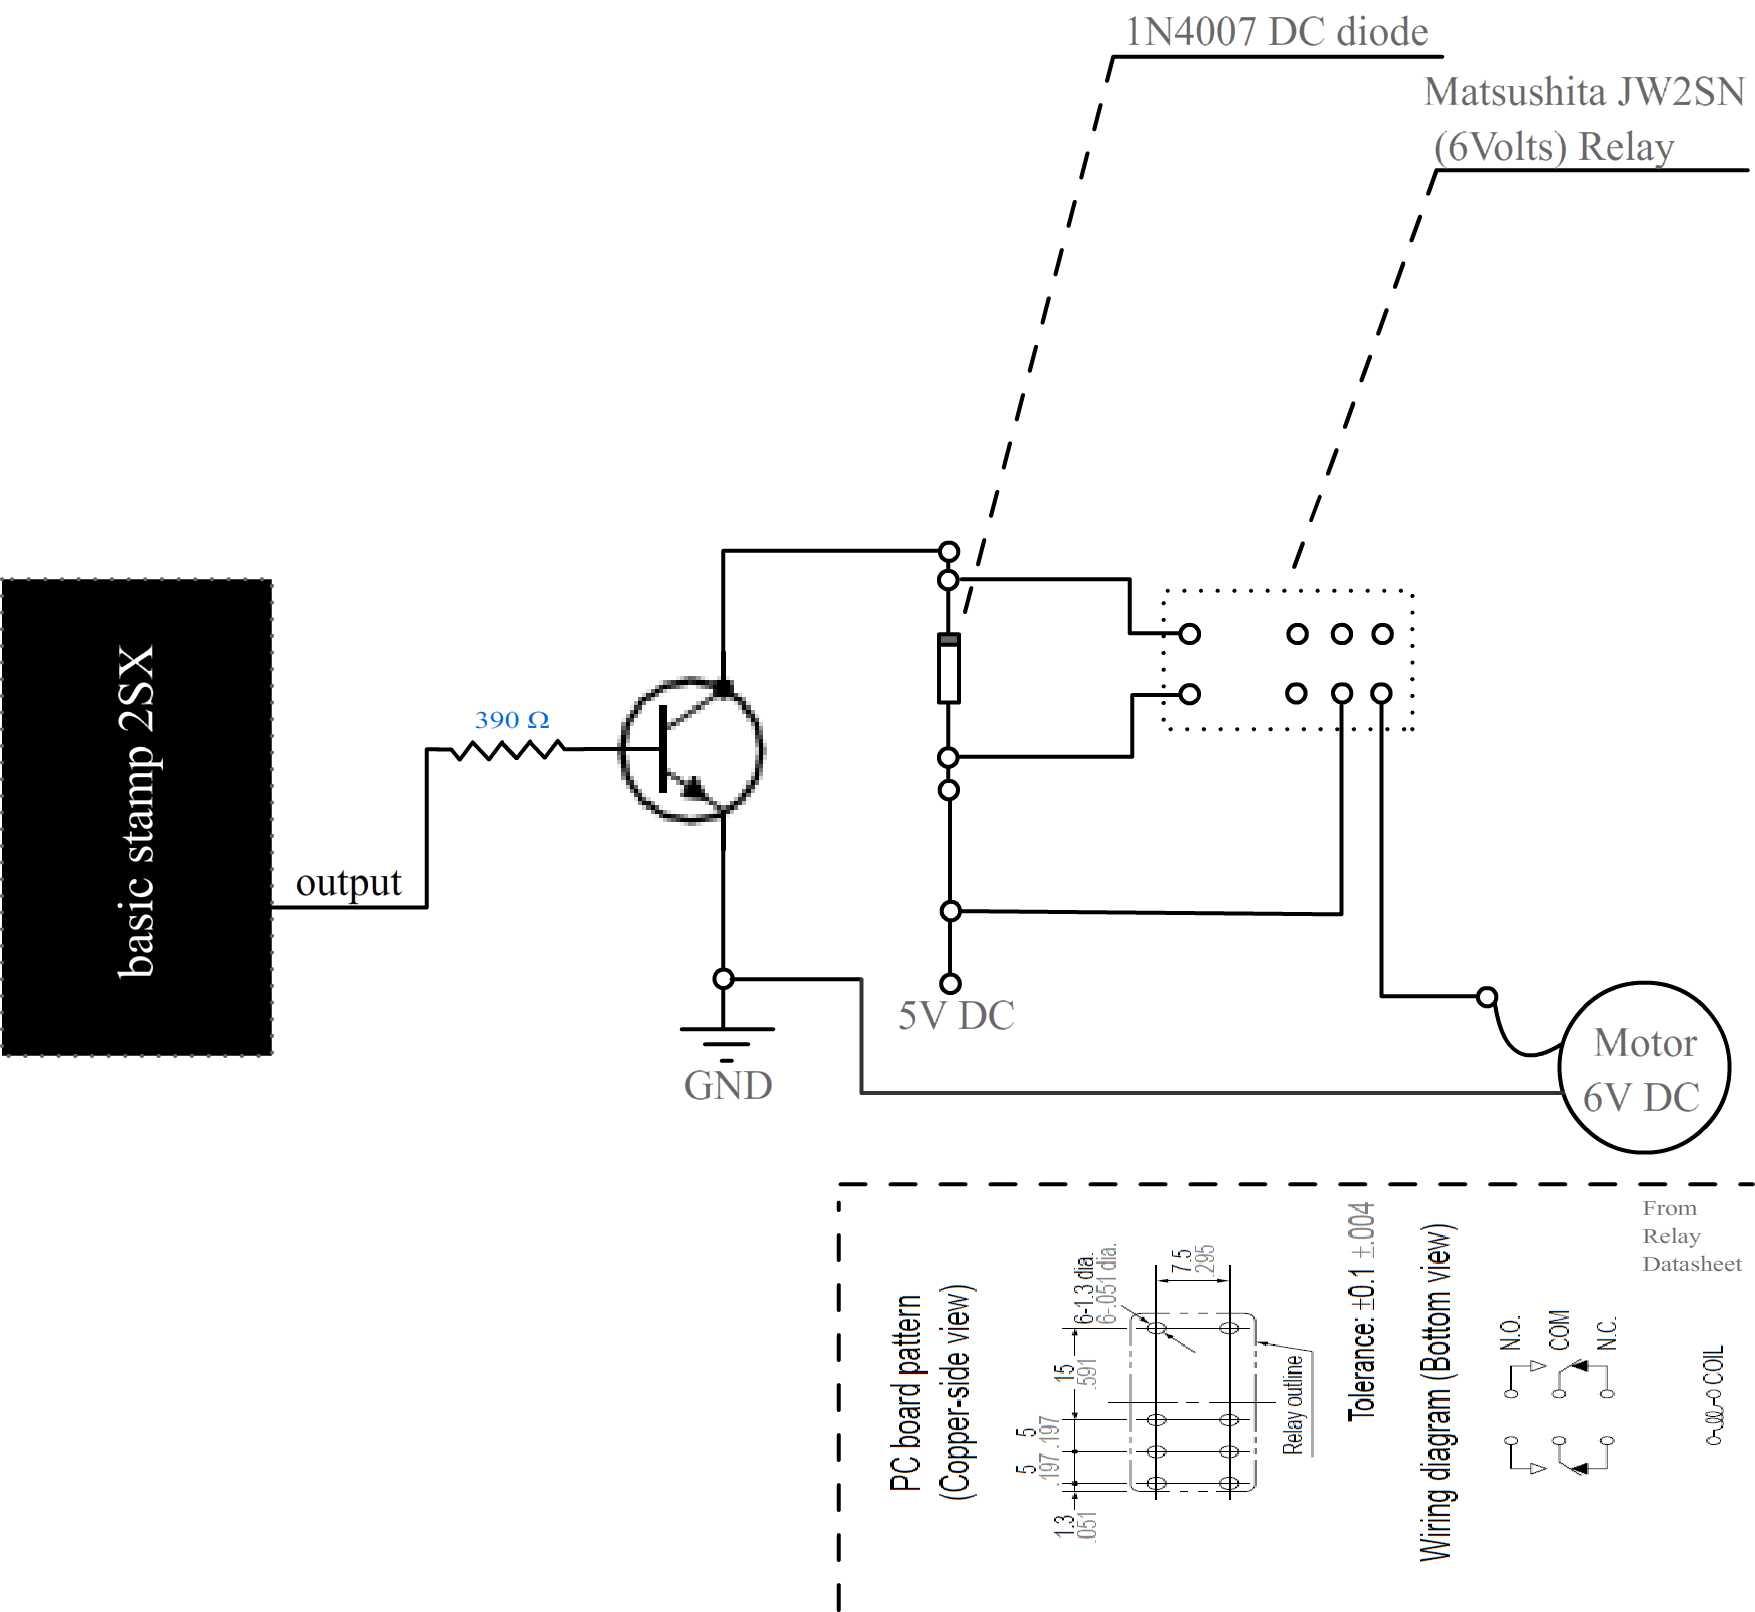 wiring a relay backwards